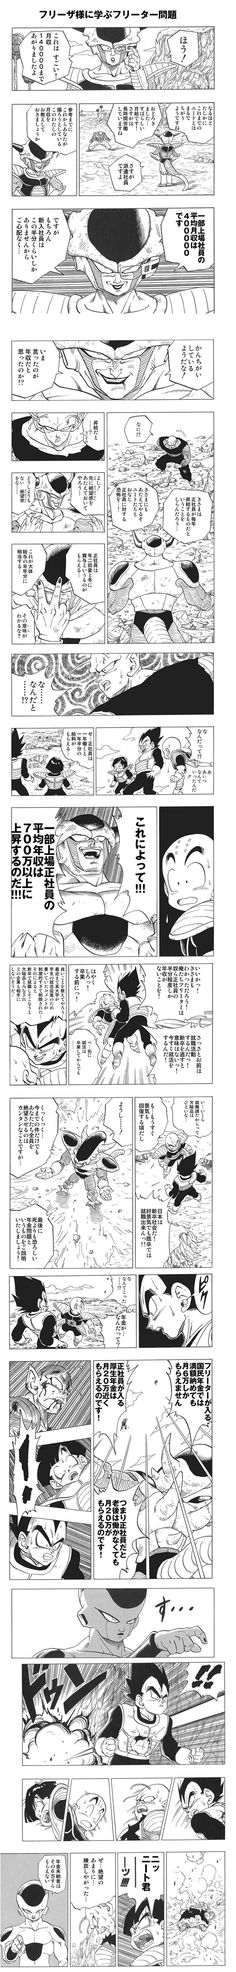 Life Lessons, Dragon Ball, Sheet Music, Character Design, Stationery, Wisdom, Marketing, Manga, Words